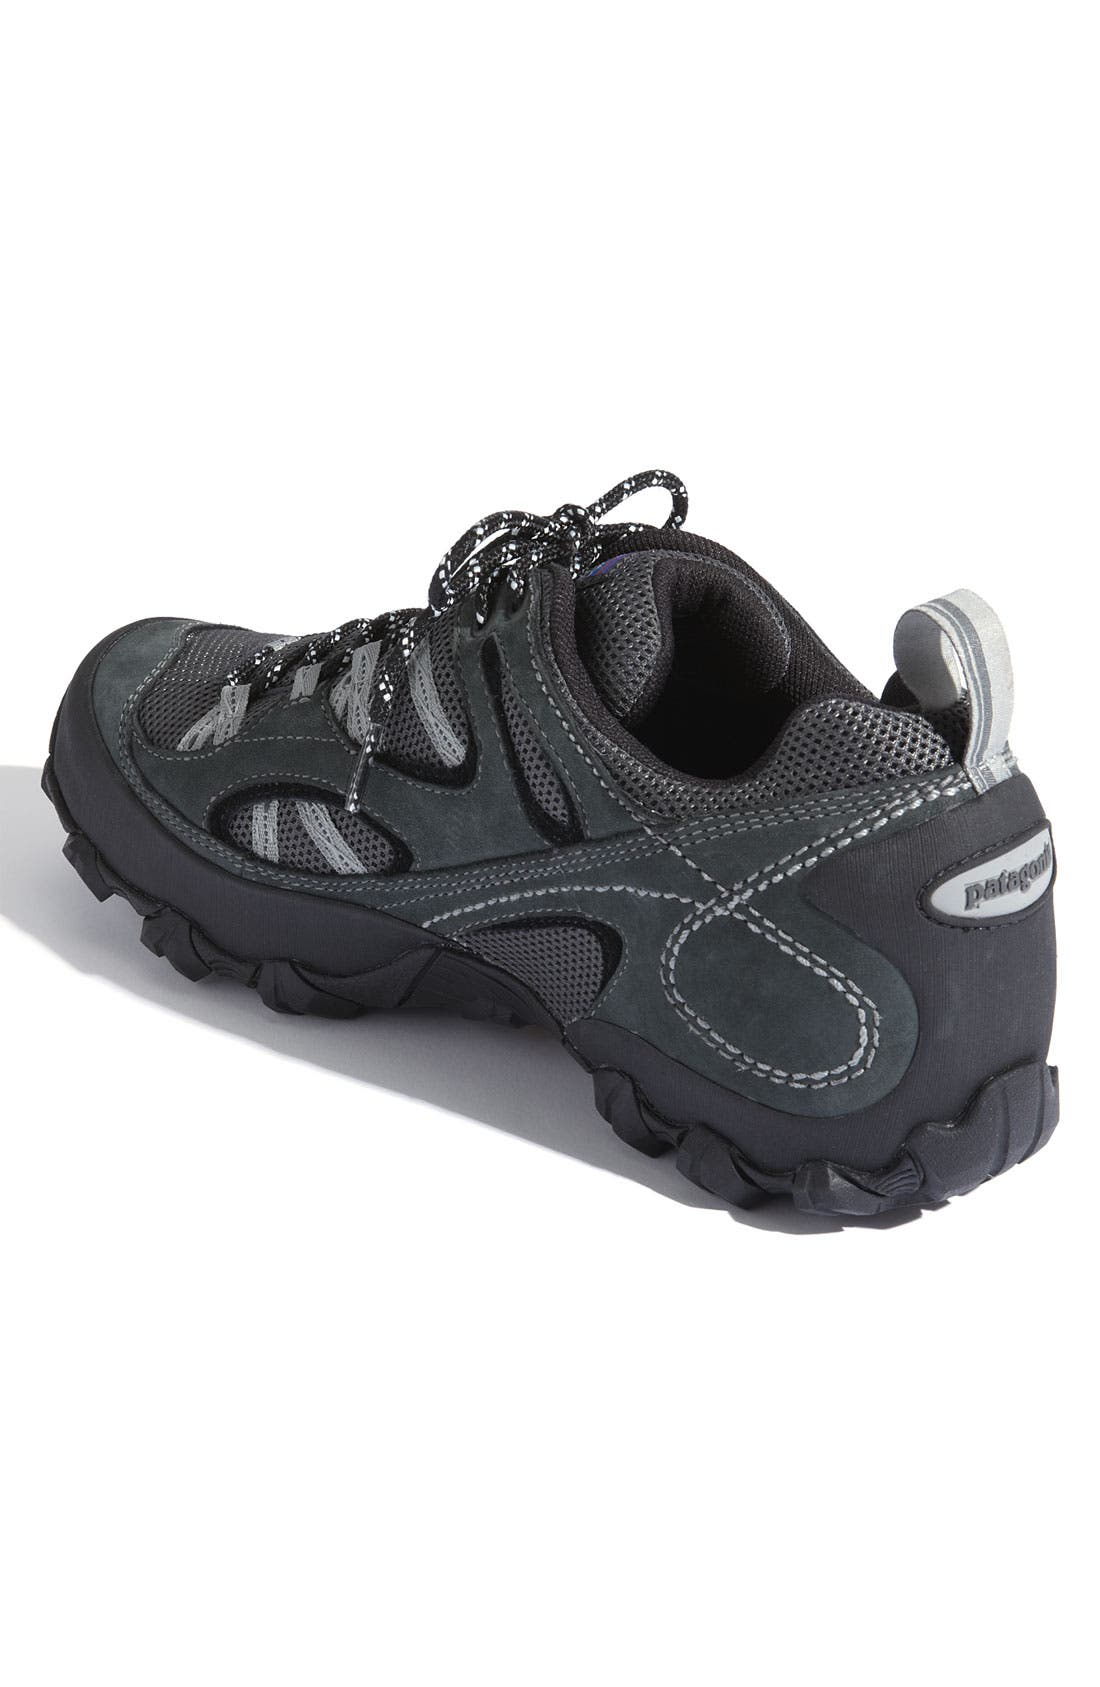 Alternate Image 2  - Patagonia 'Drifter AC GTX' Trail Shoe